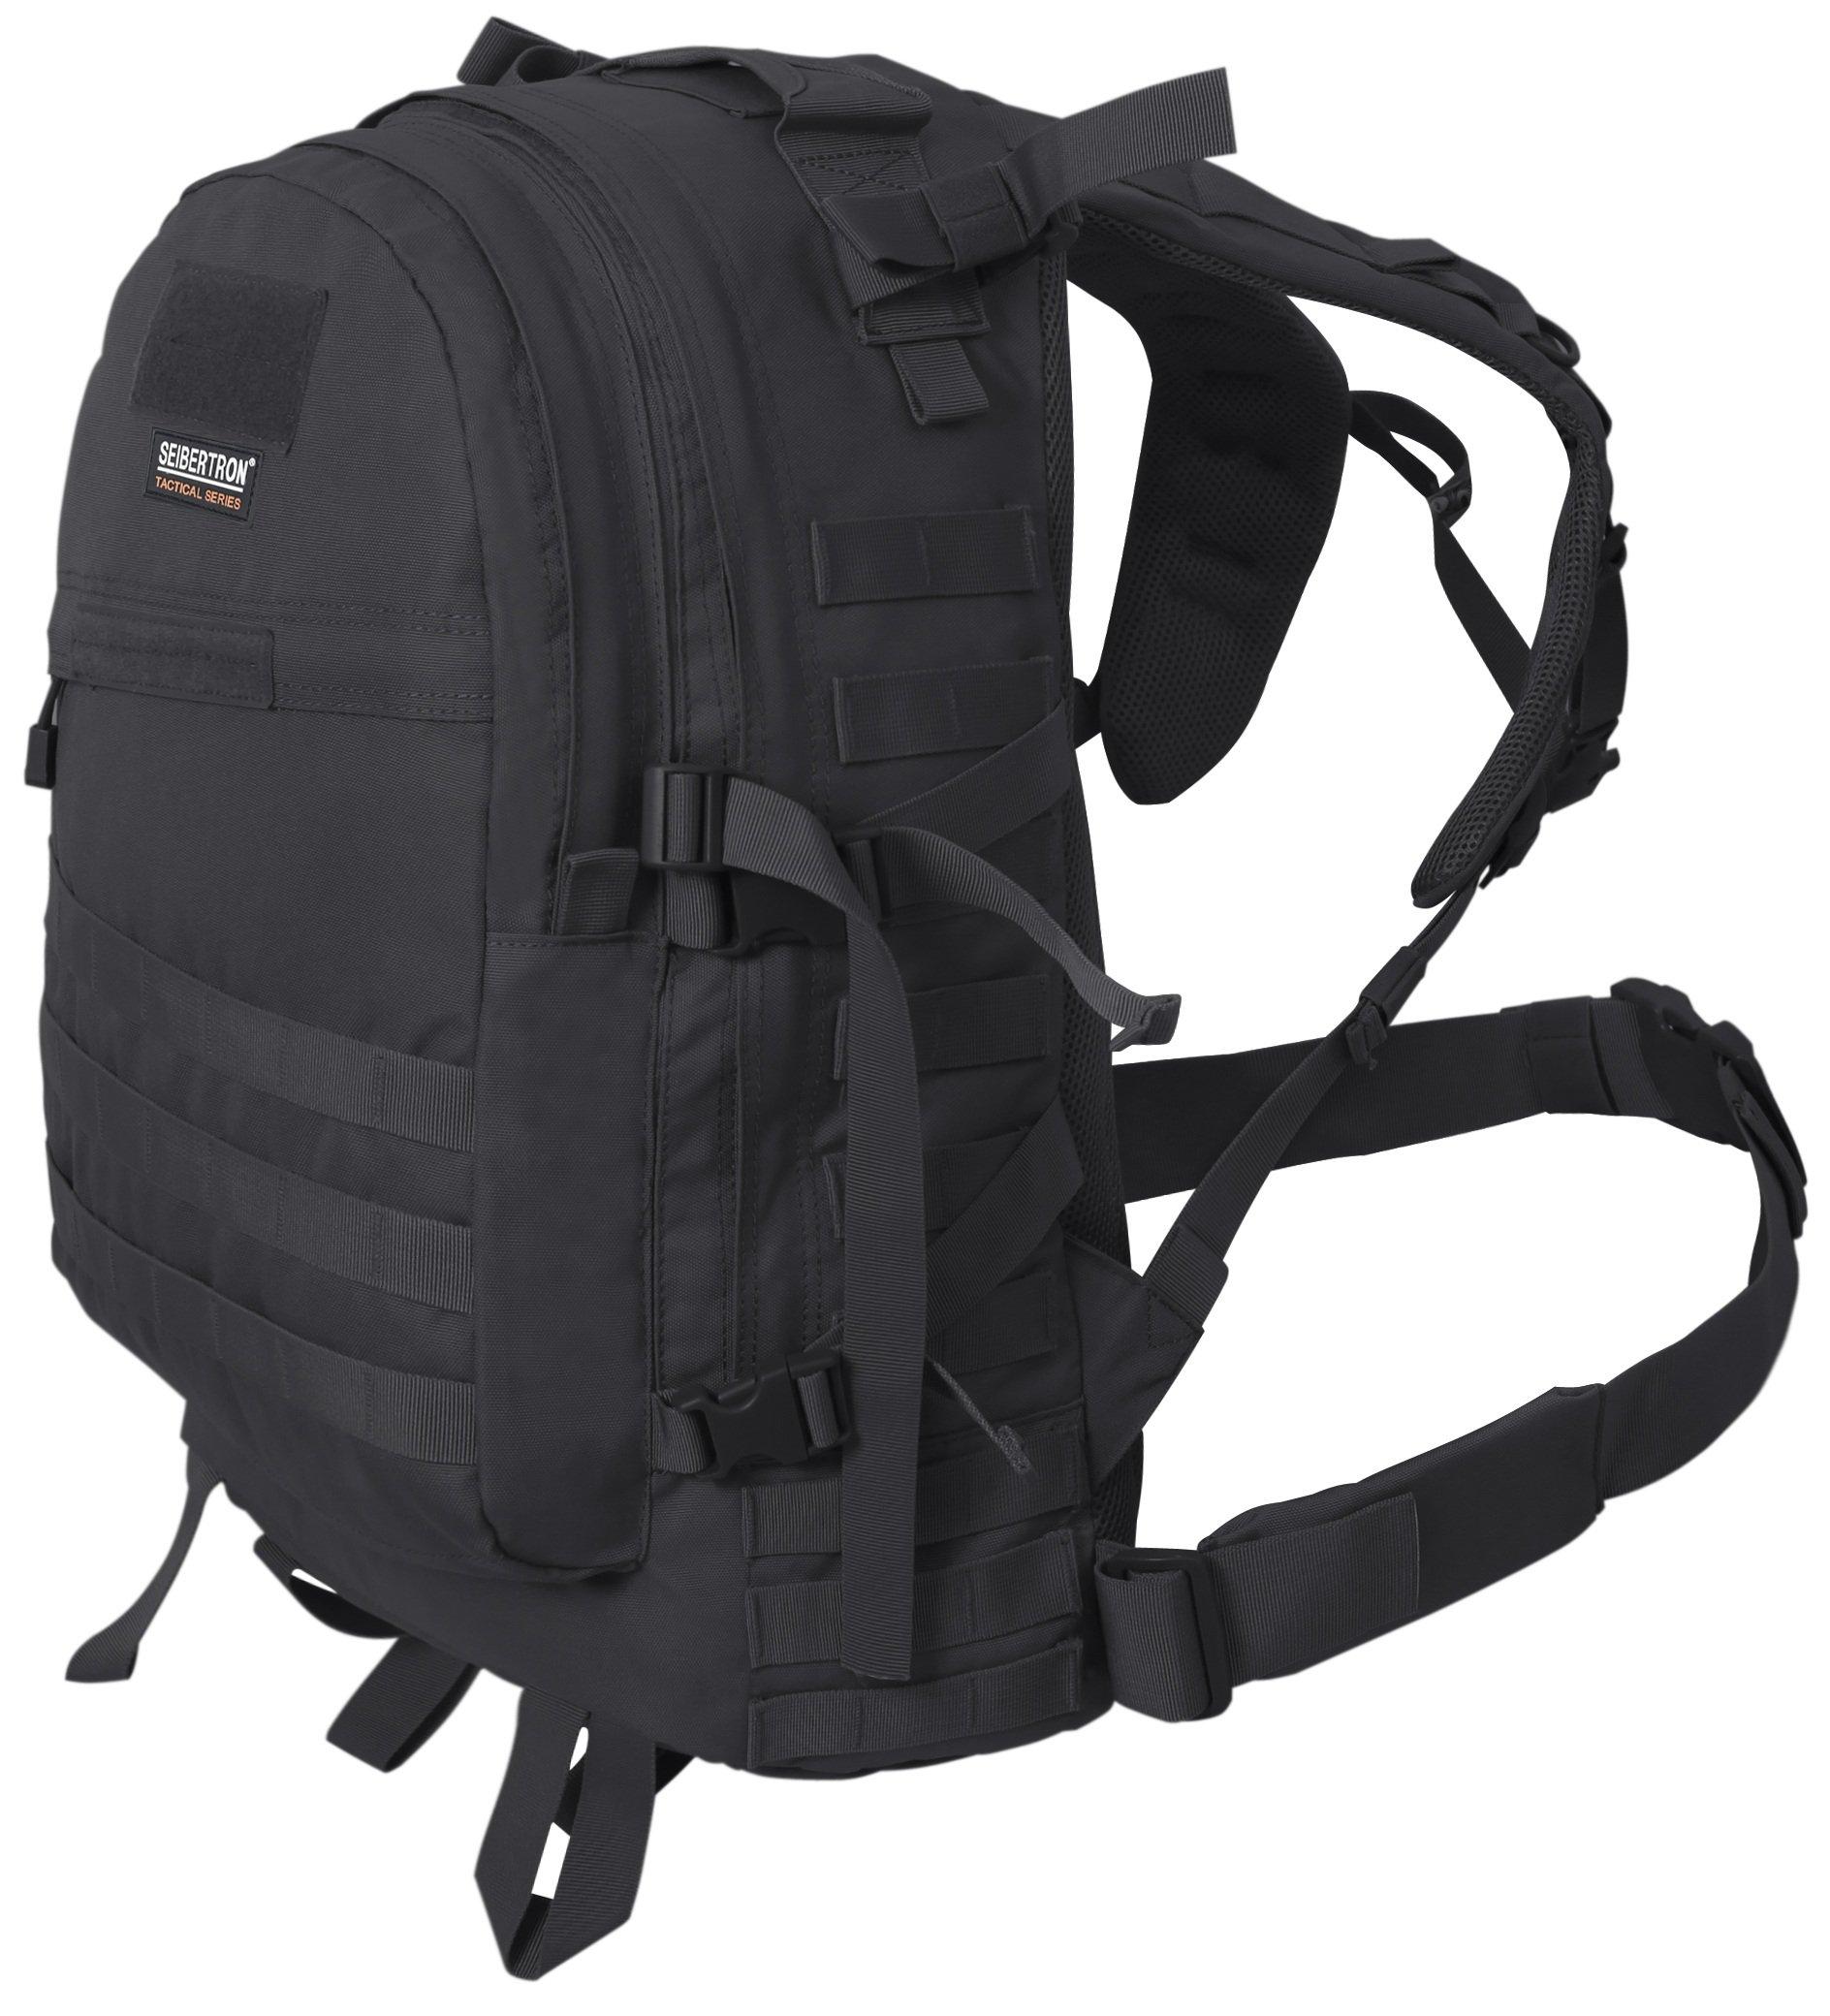 Seibertron Roving Motorcycle Riding Street Dirt Bike Waterproof Rucksack Backpack with Raincover (black-main bag)